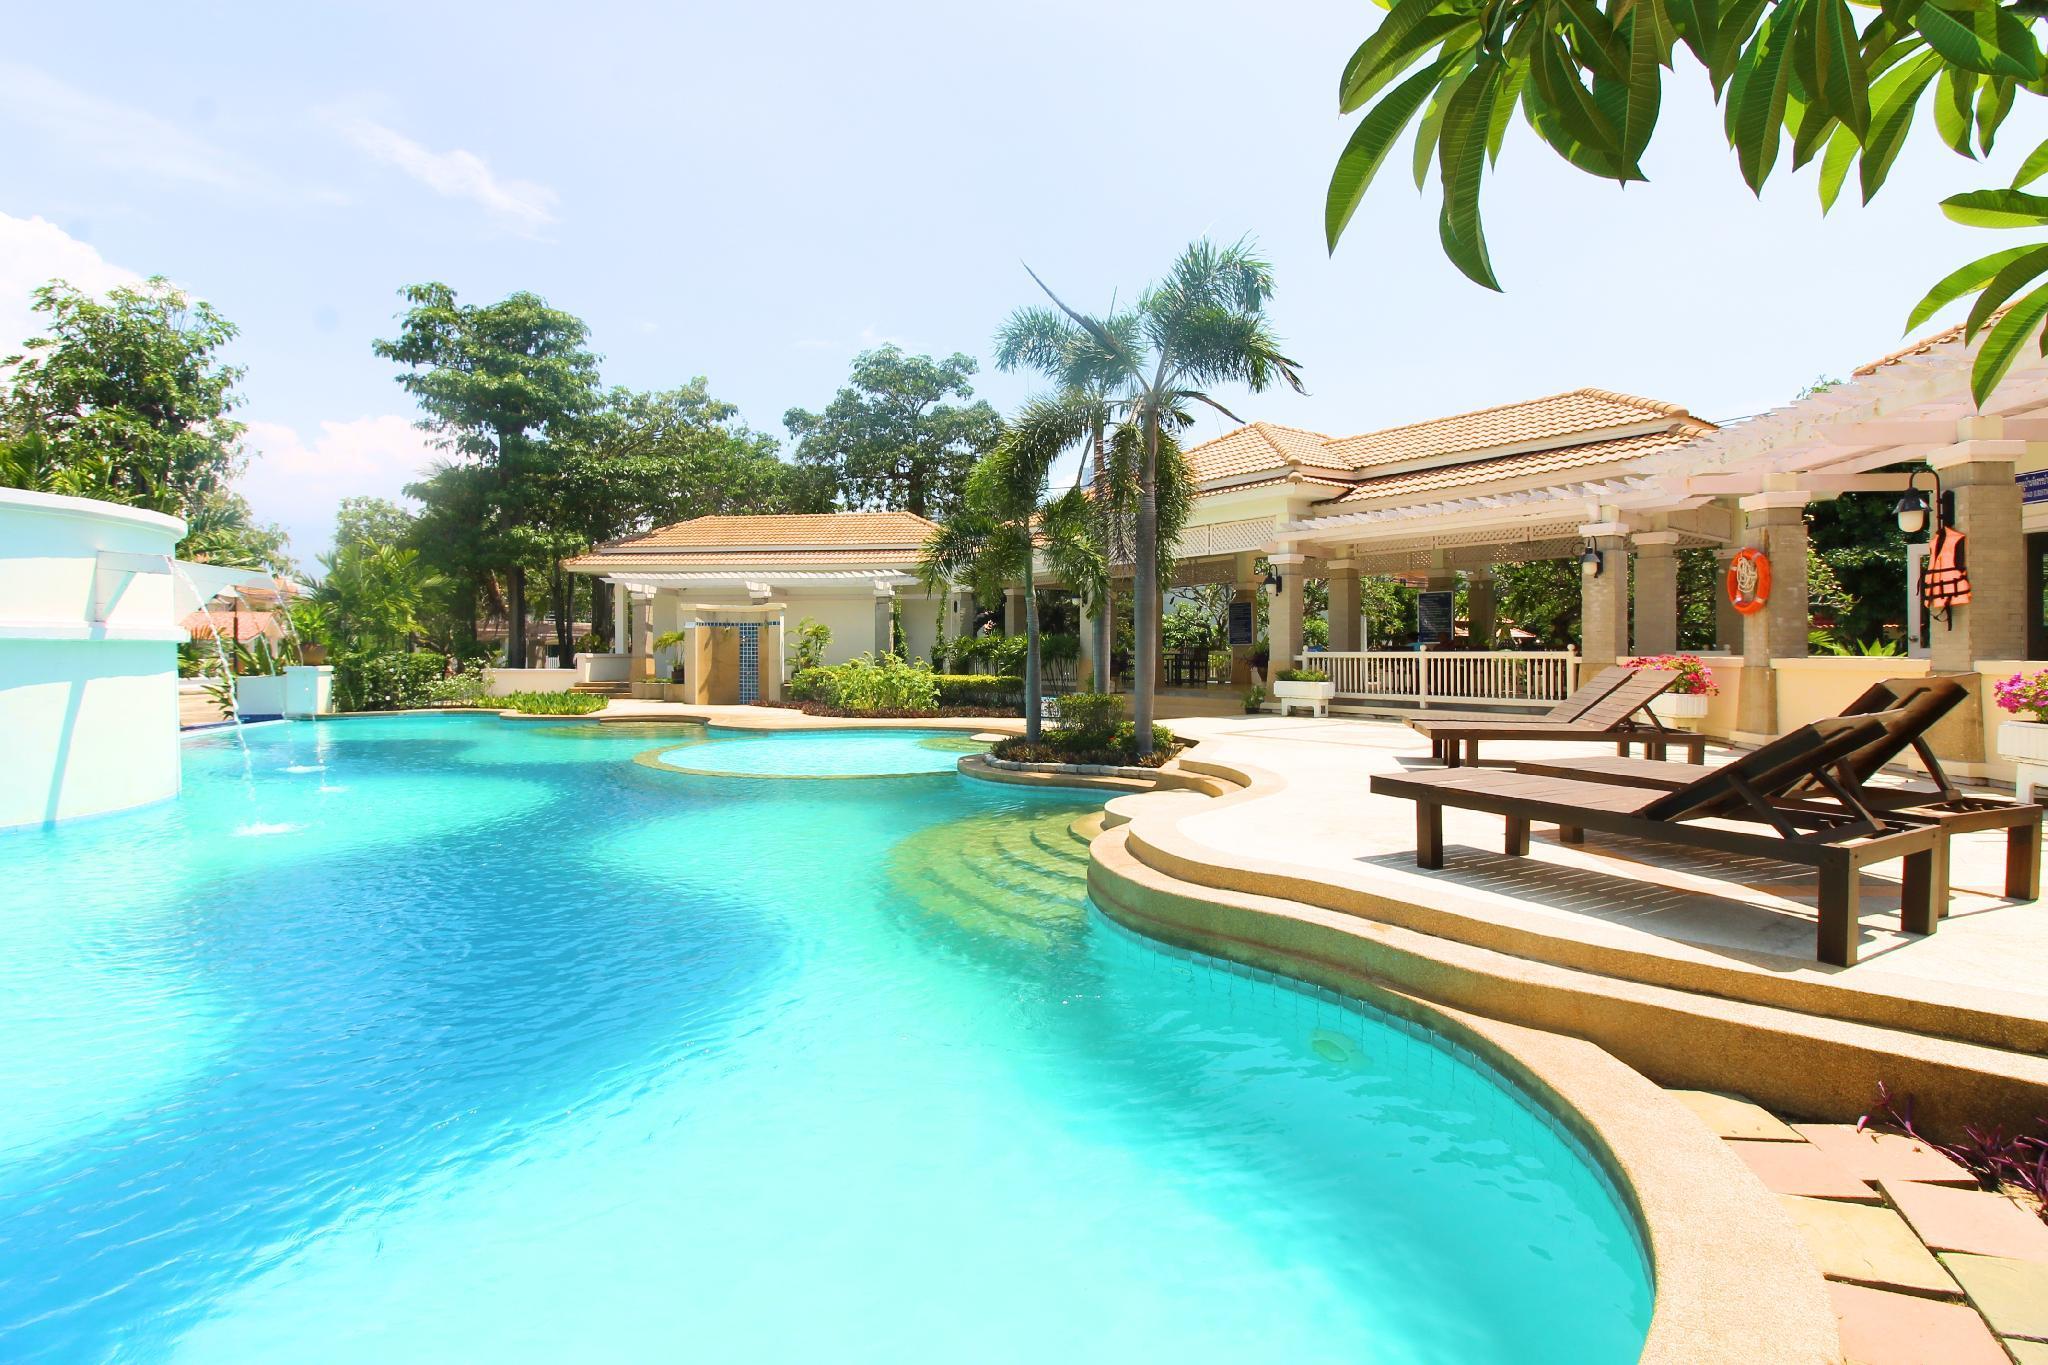 Grande 5 Beds BBQ Villa With Pool View Near Beach